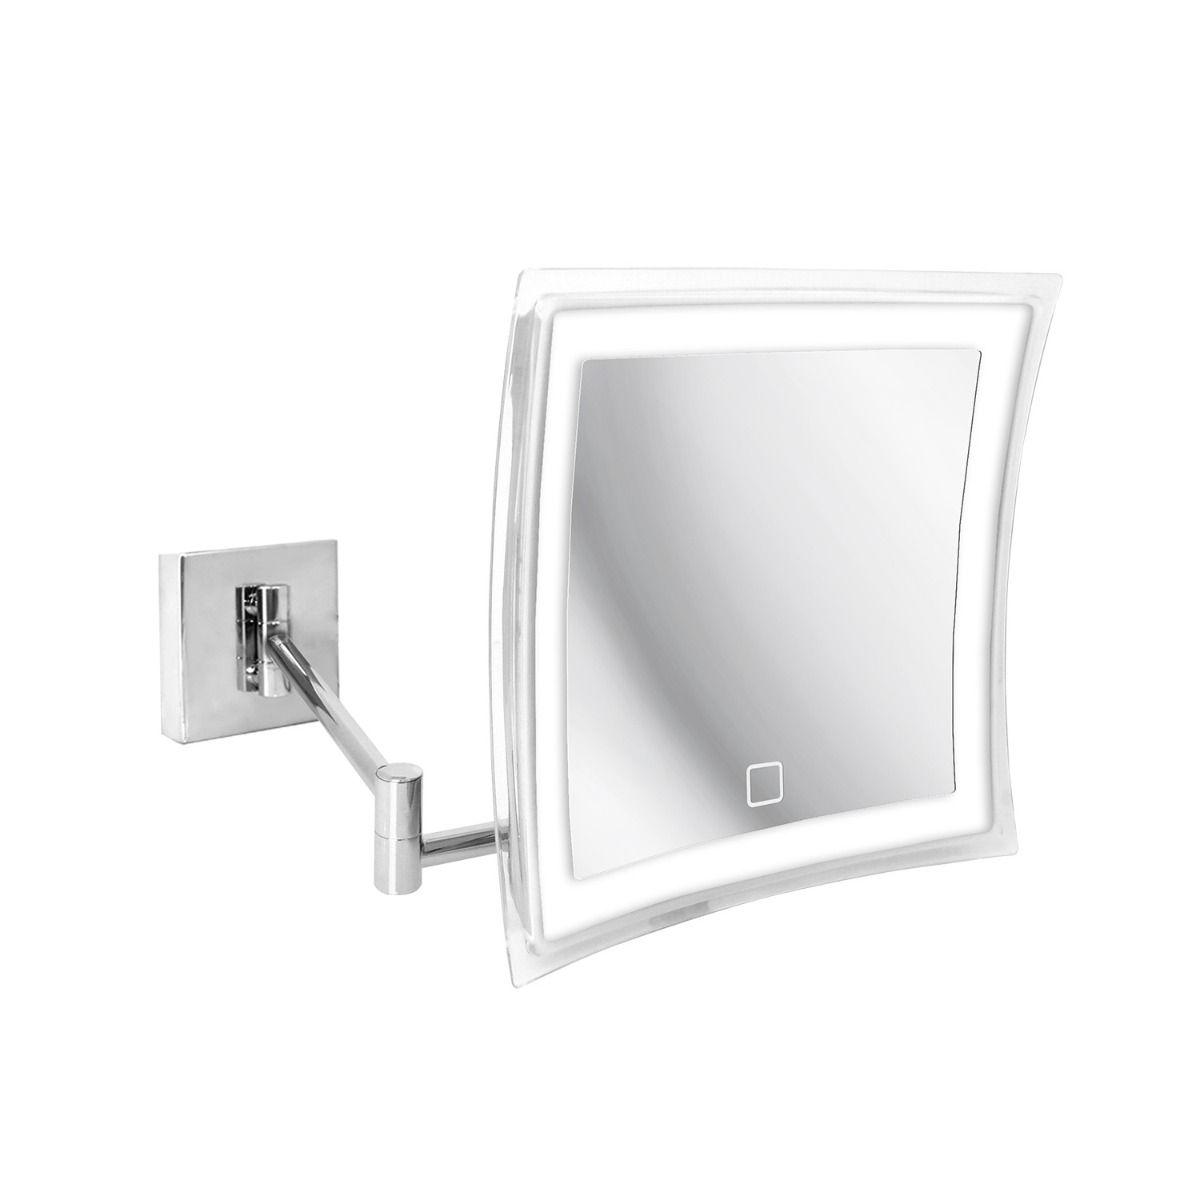 Beauty Touch Sensor Wall Mounted Led Magnifying Makeup Mirror 5x Modo Bath